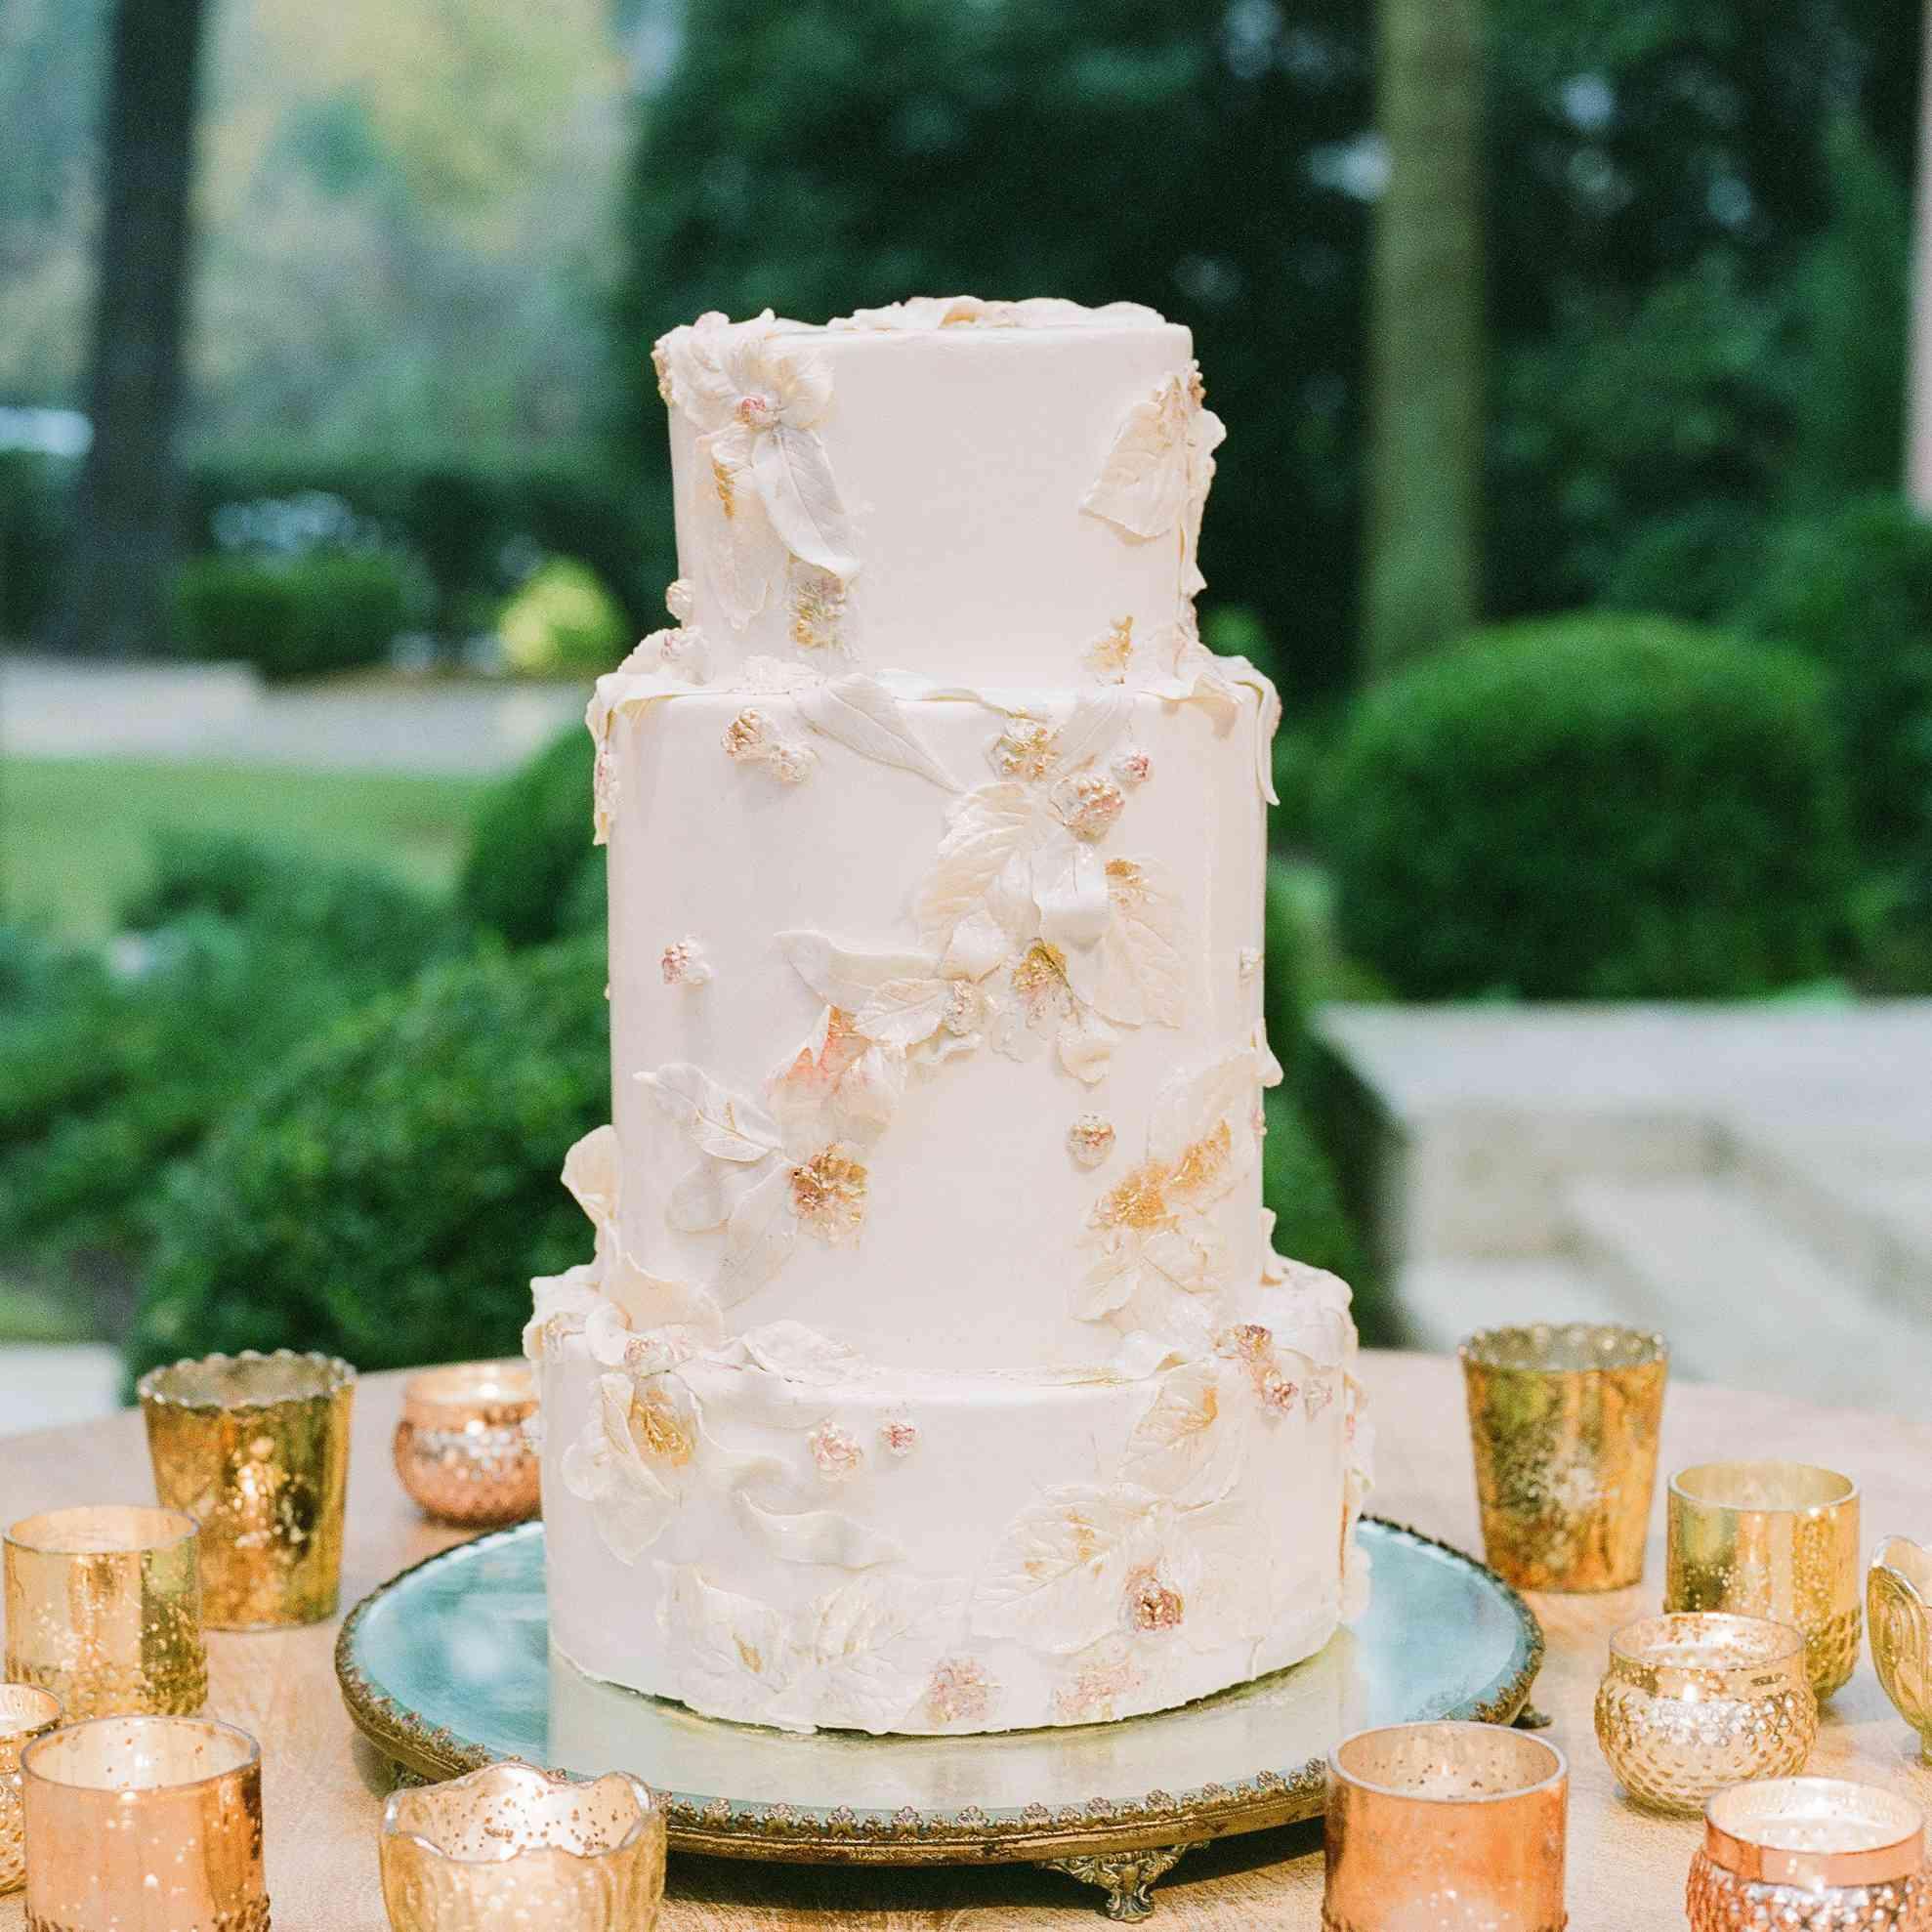 Wedding most cakes extravagant 55 Beautiful